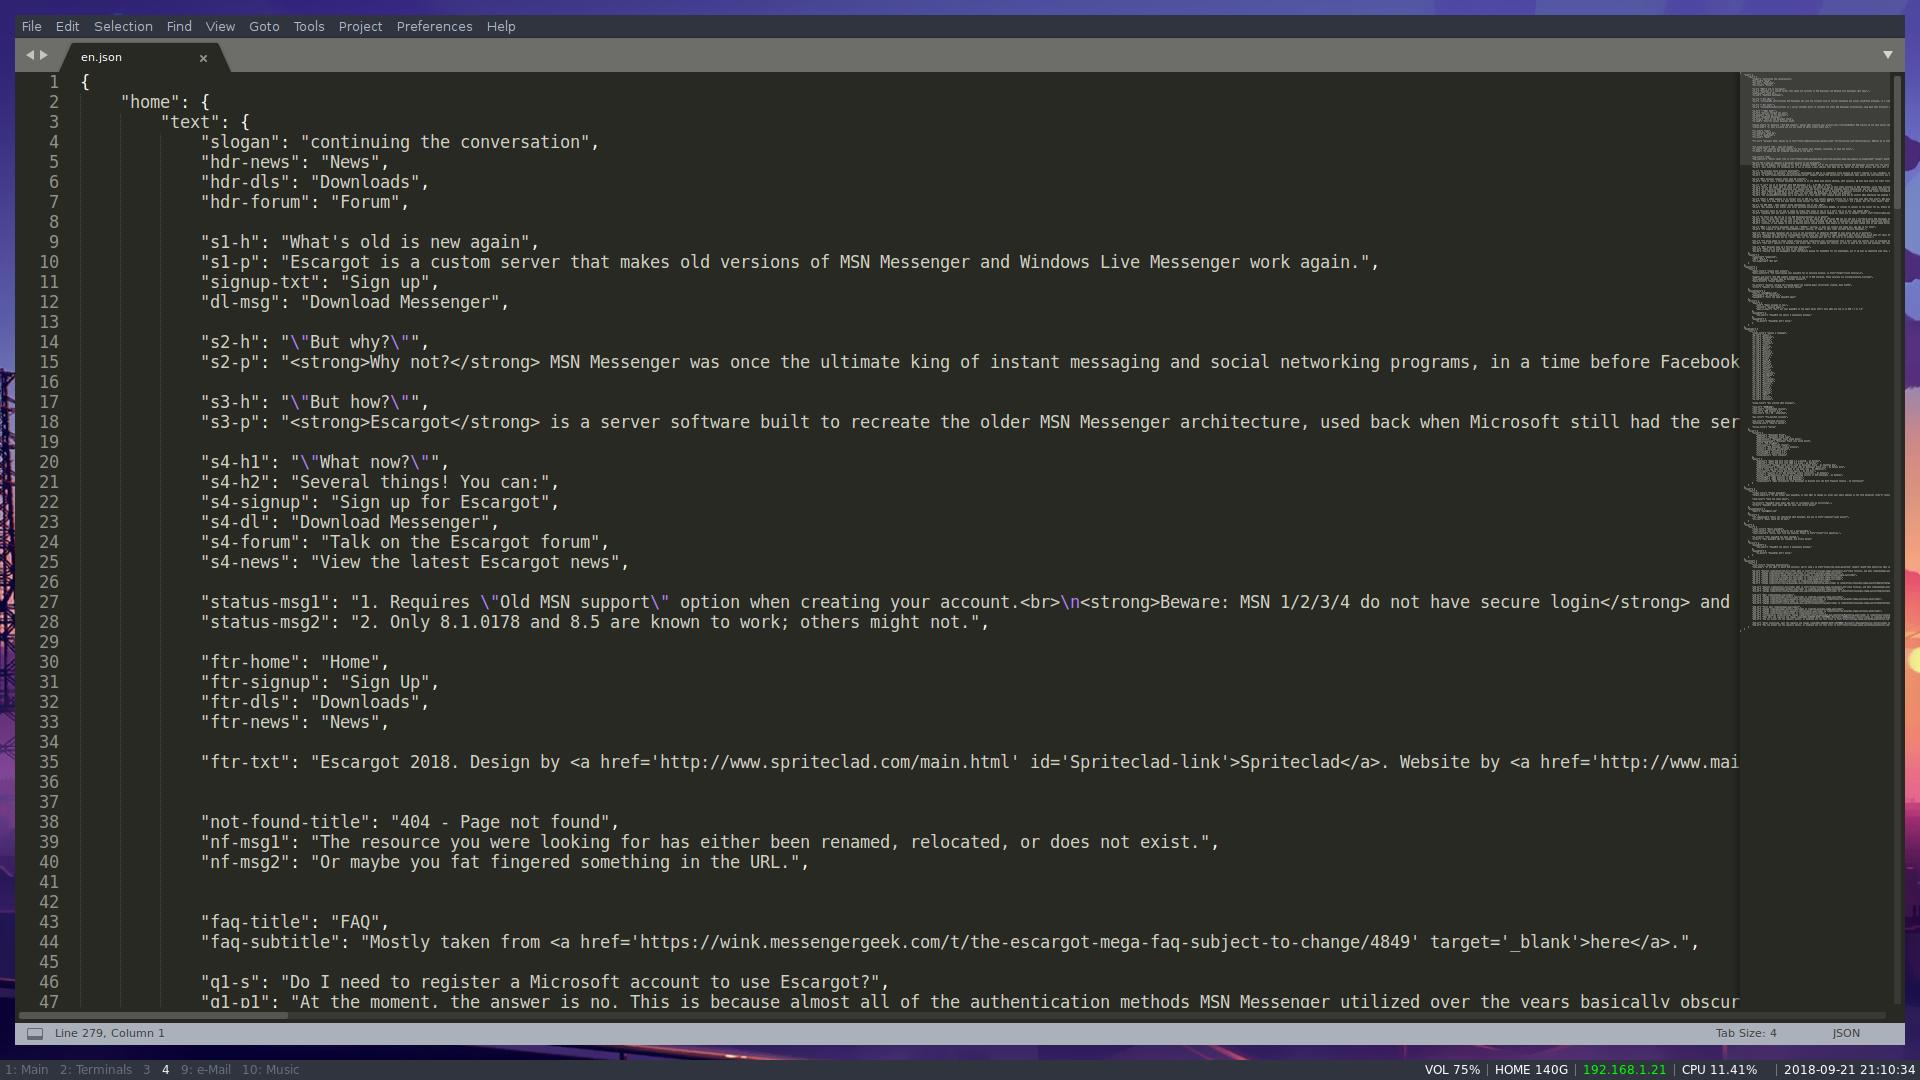 I need translators for the new Escargot website - Escargot MSN